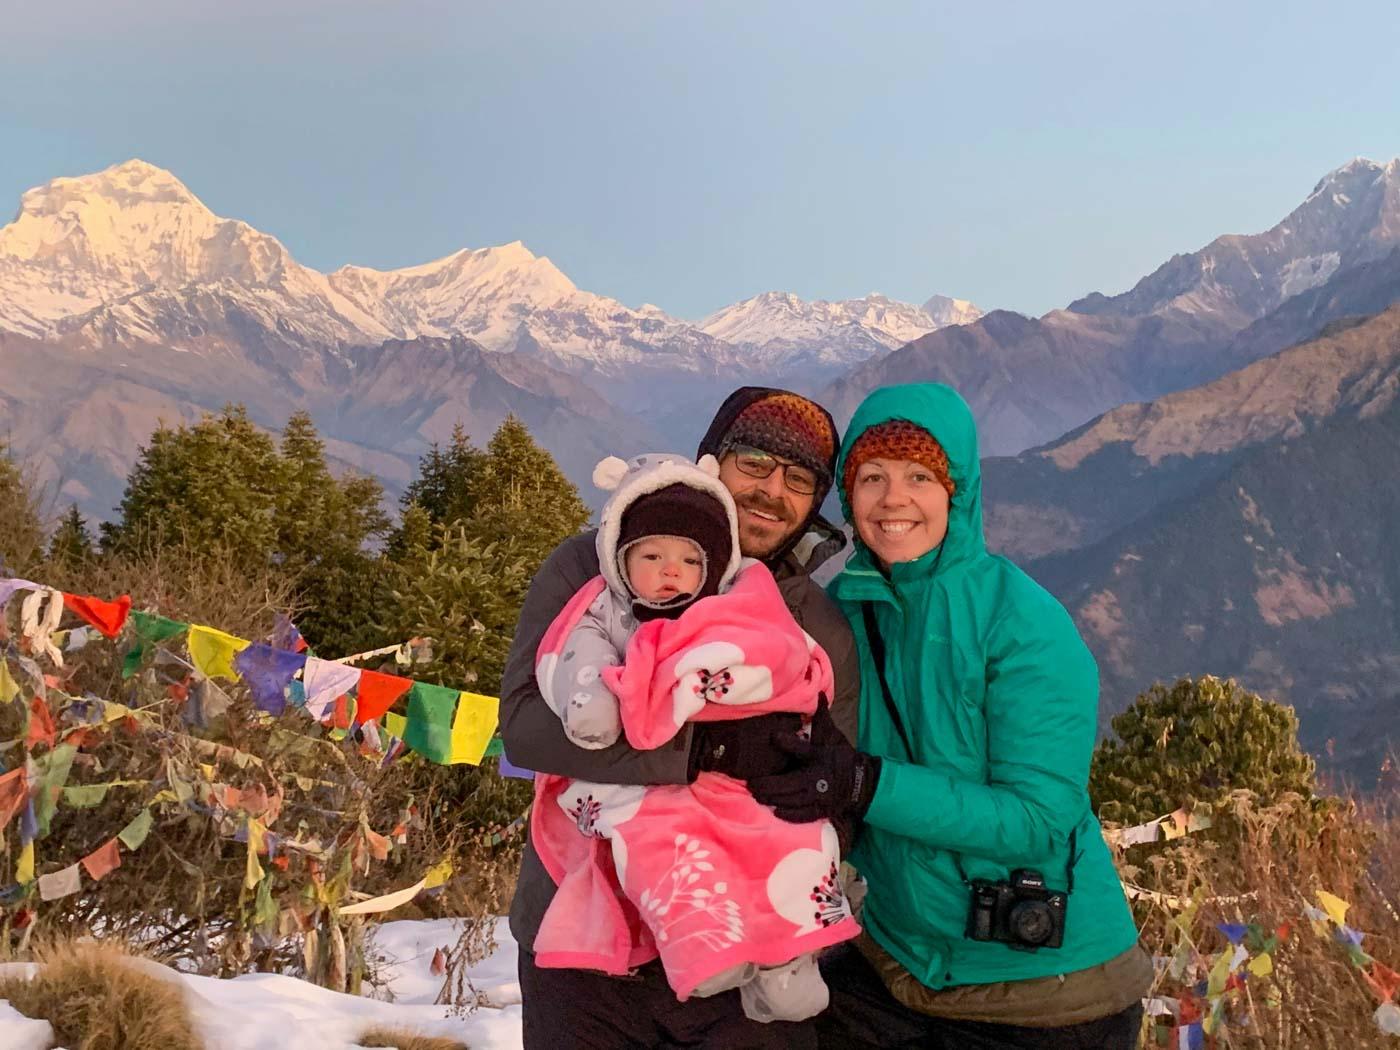 Ghorepani-Poon-Hill-Trek-Nepal-COVER.jpg